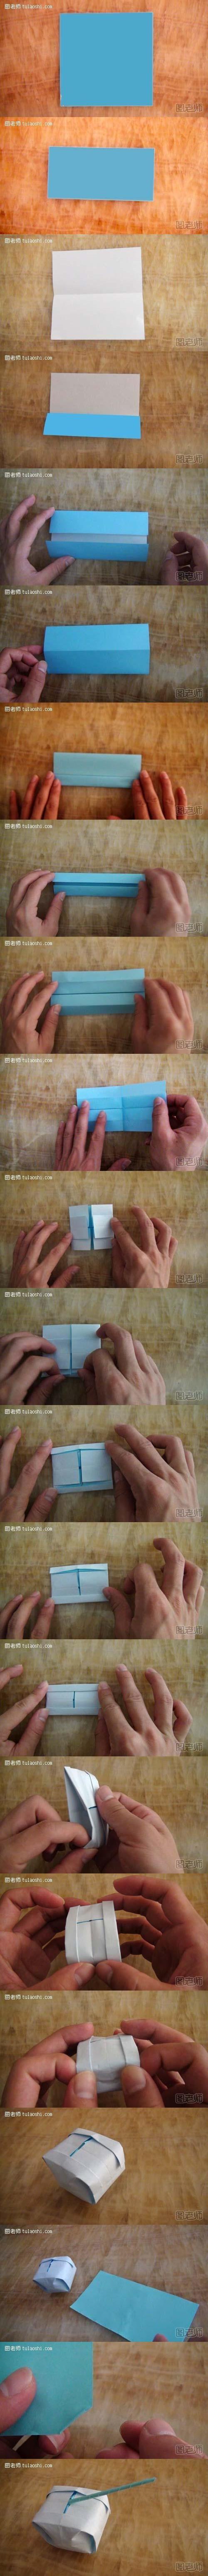 Informal Urban Communities Initiative » Origami   6182x500